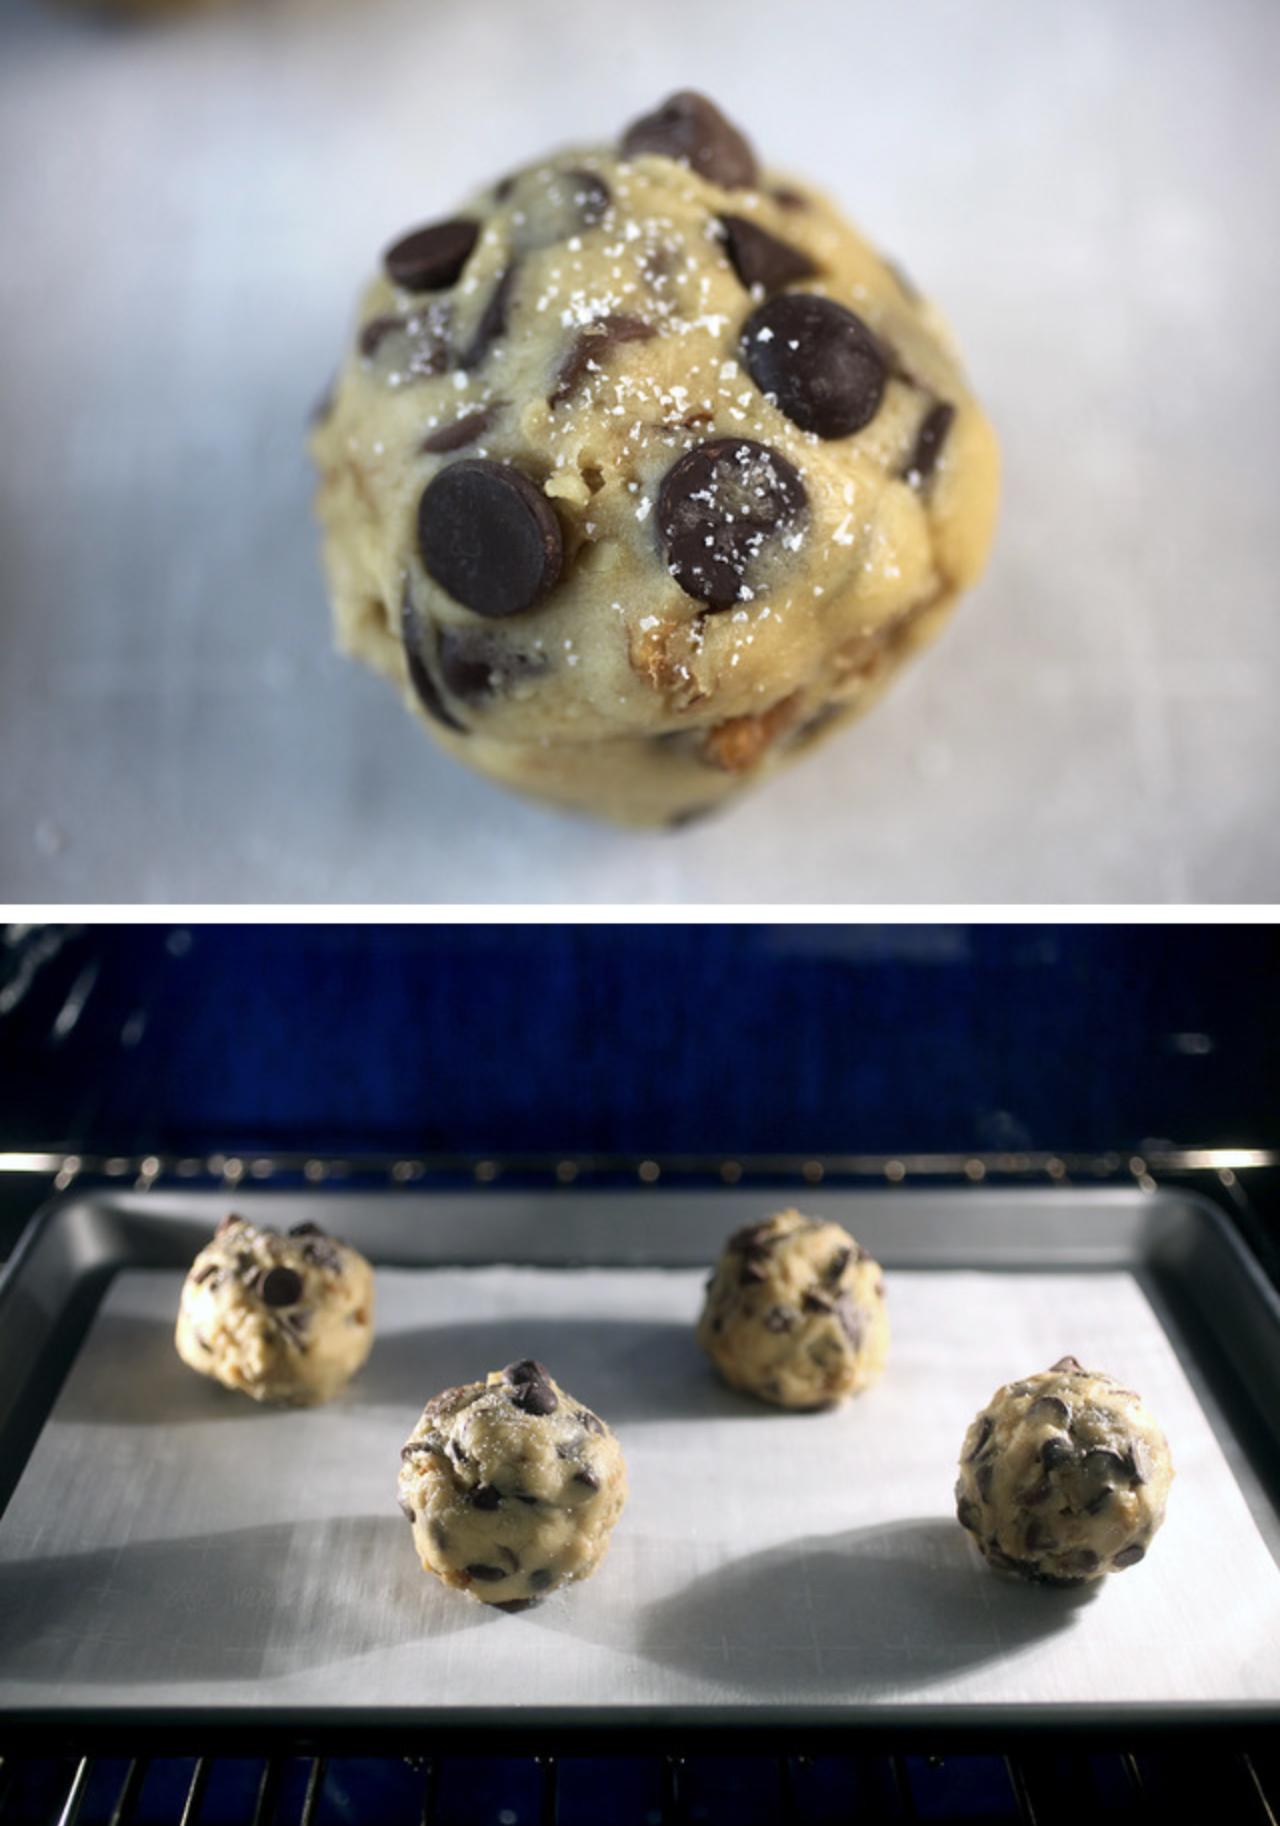 Bravetart's Levain-Style Chocolate Chip Cookies